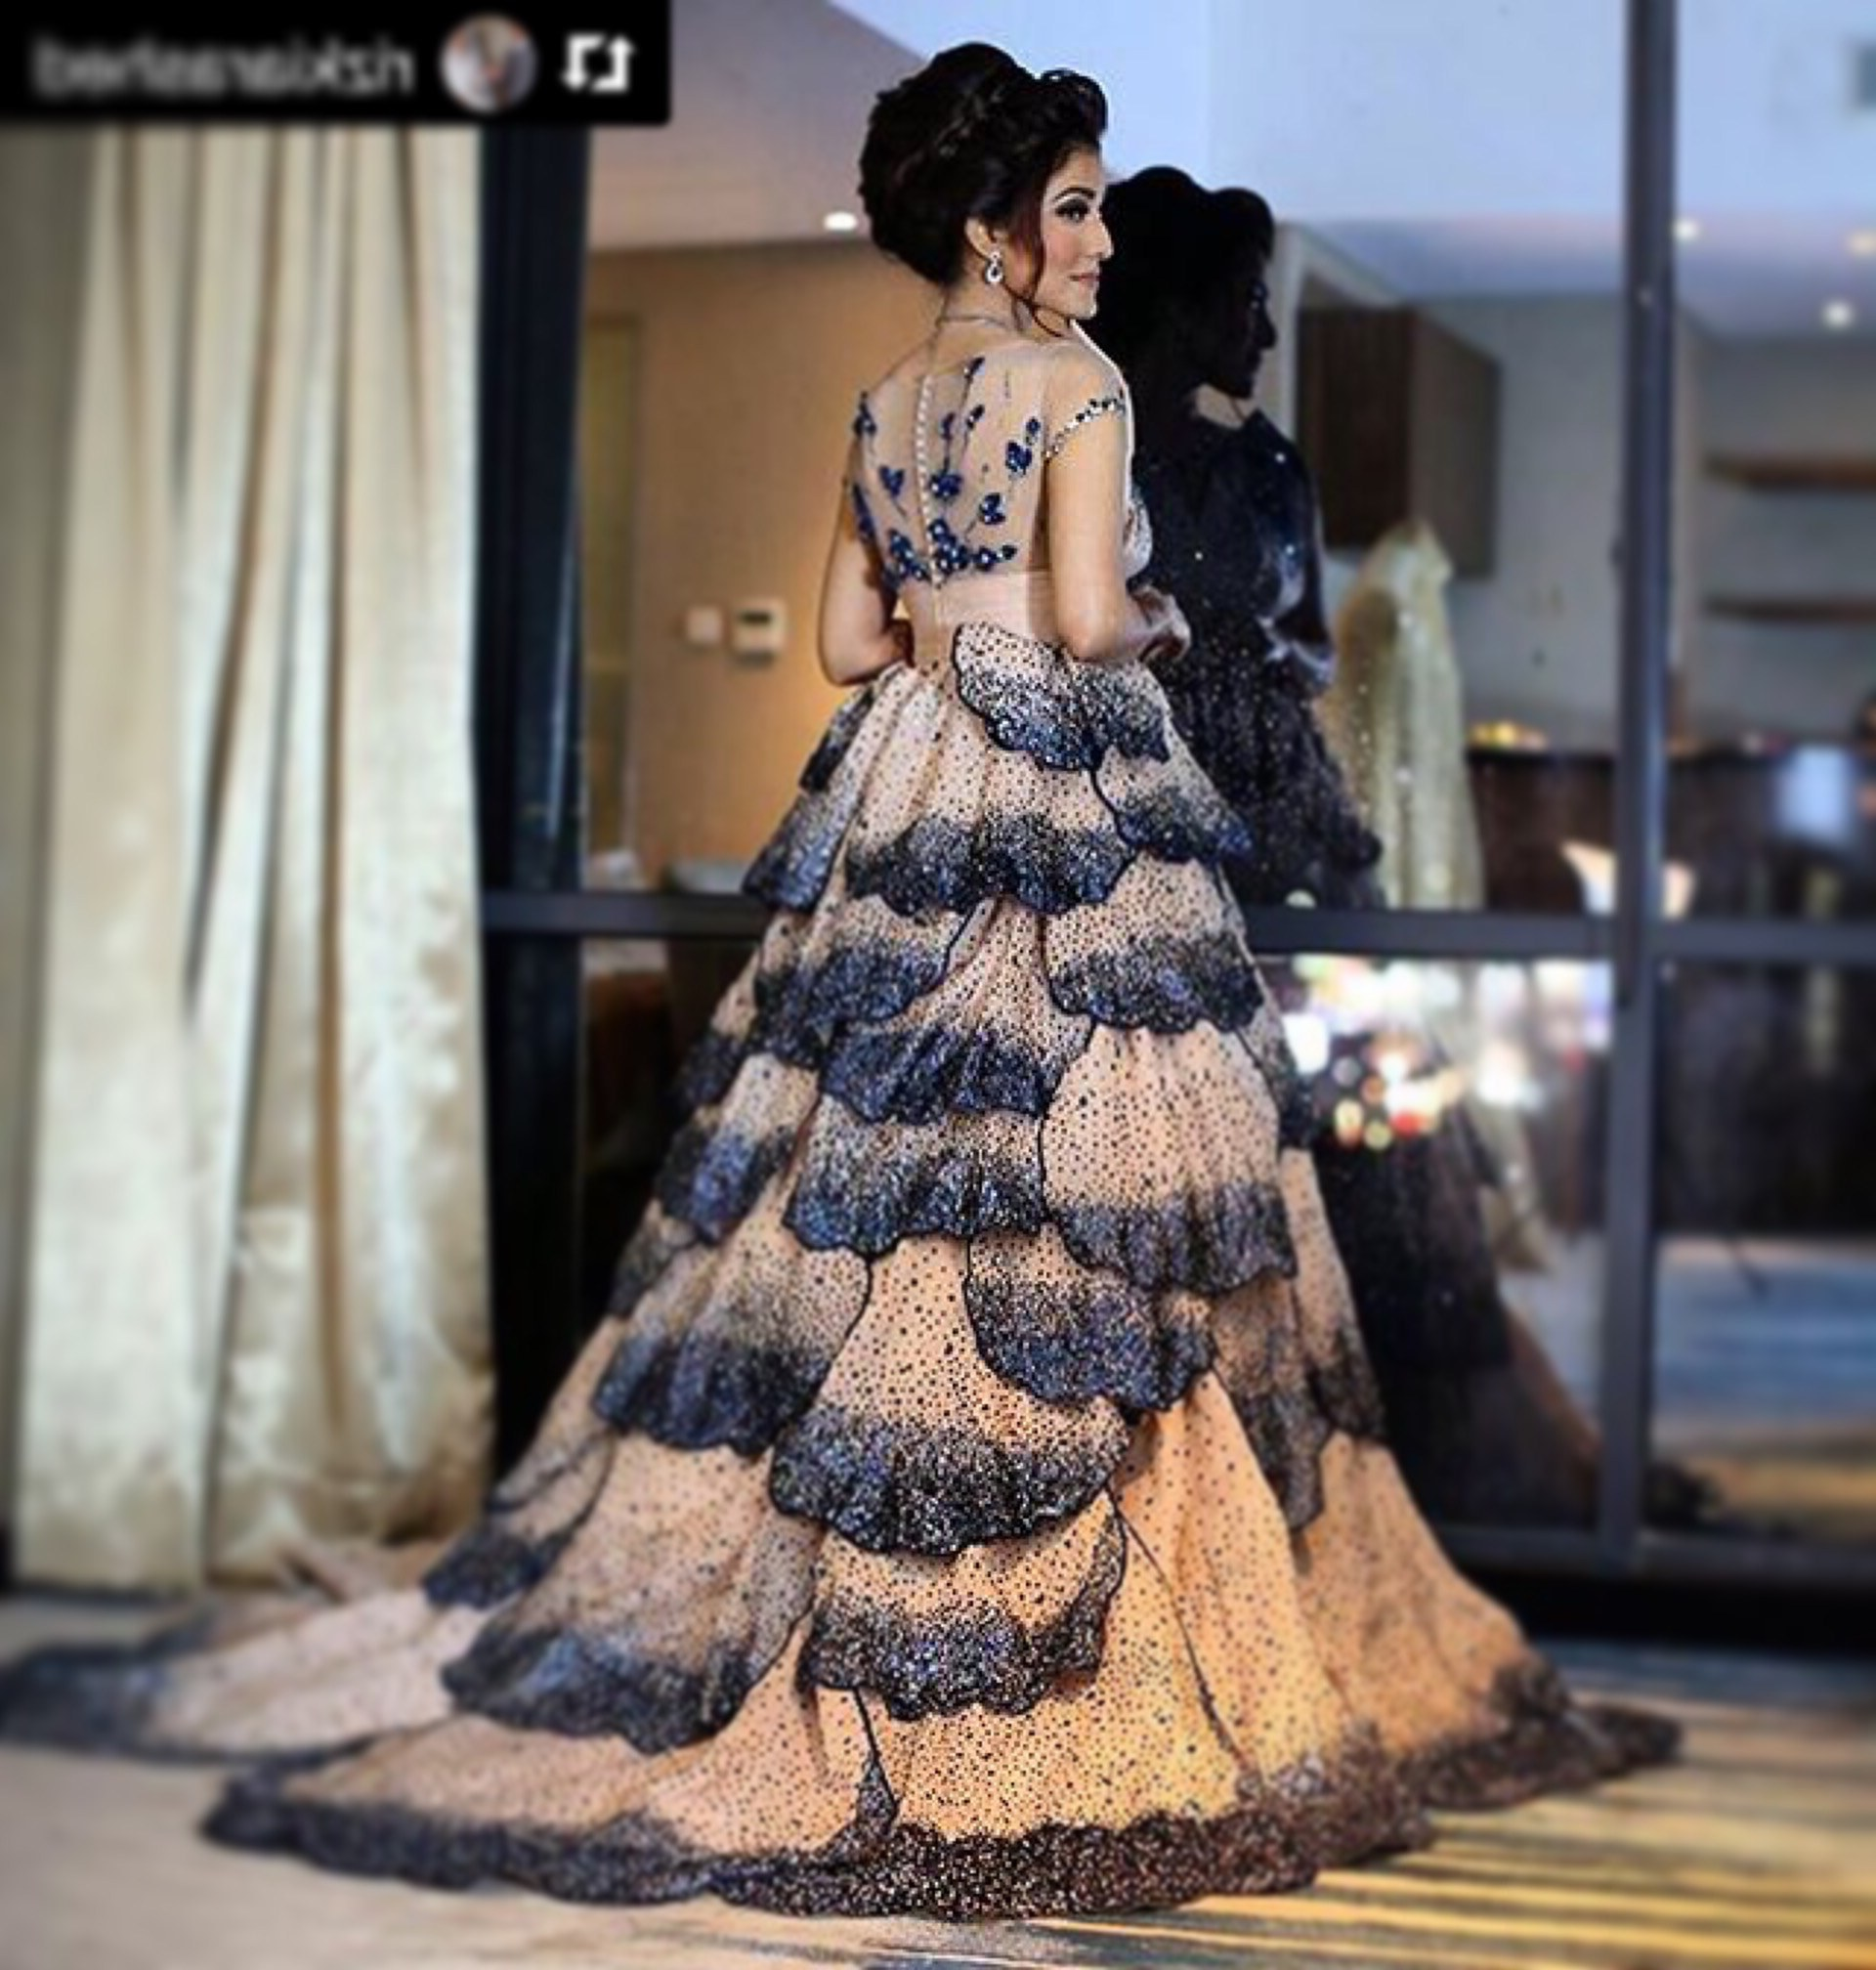 Inspirasi Model Baju Pengantin Muslimah S1du Eji atelier